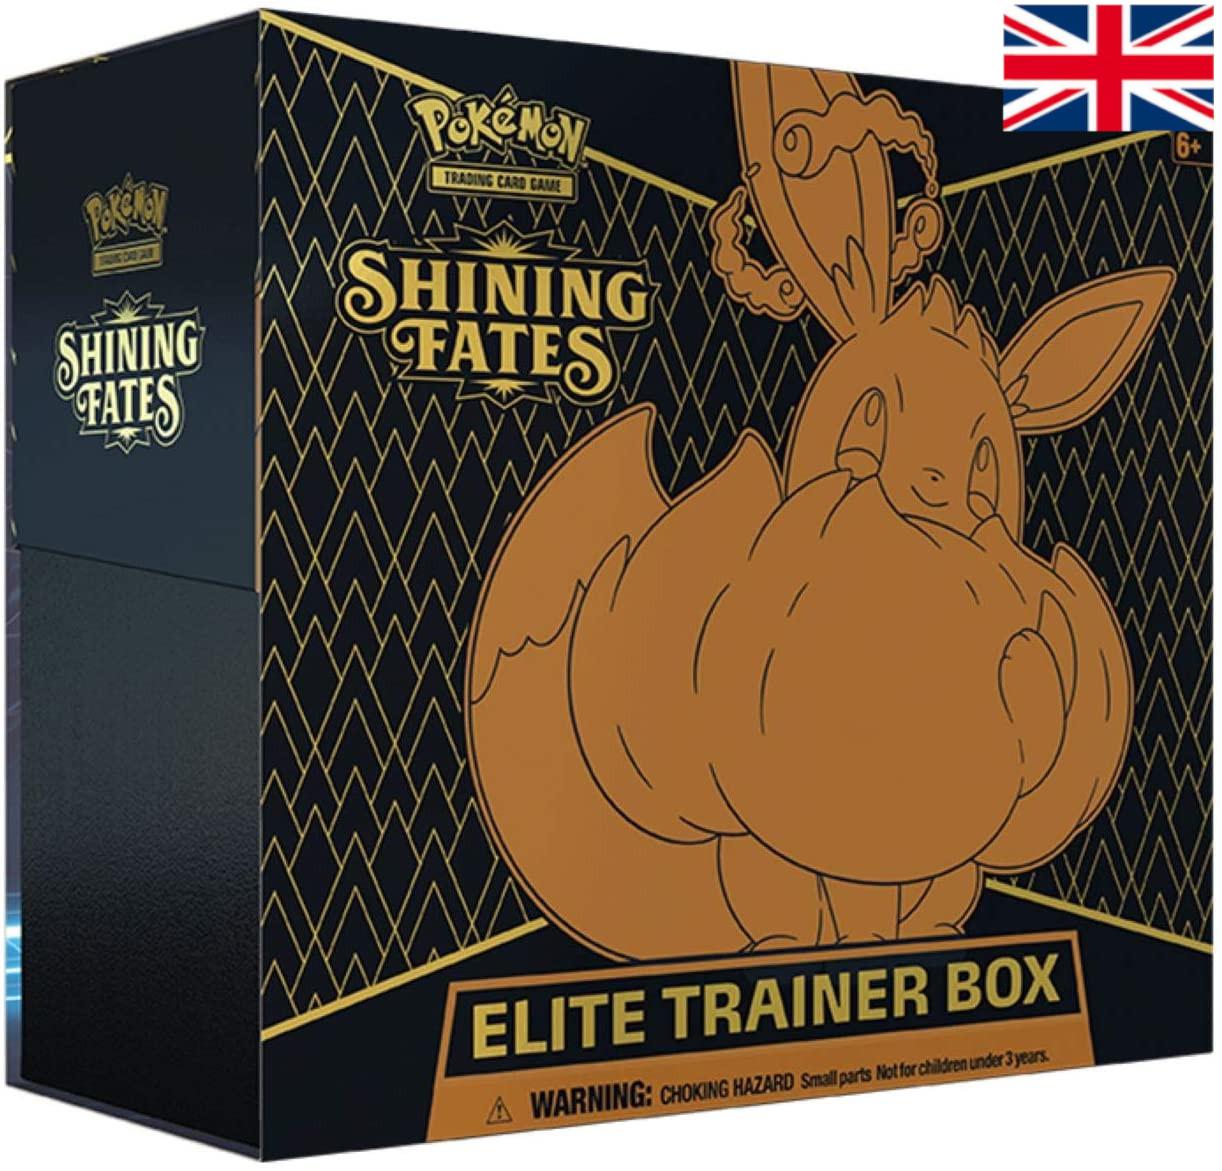 Pokémon - Shining Fates Elite Trainer Box